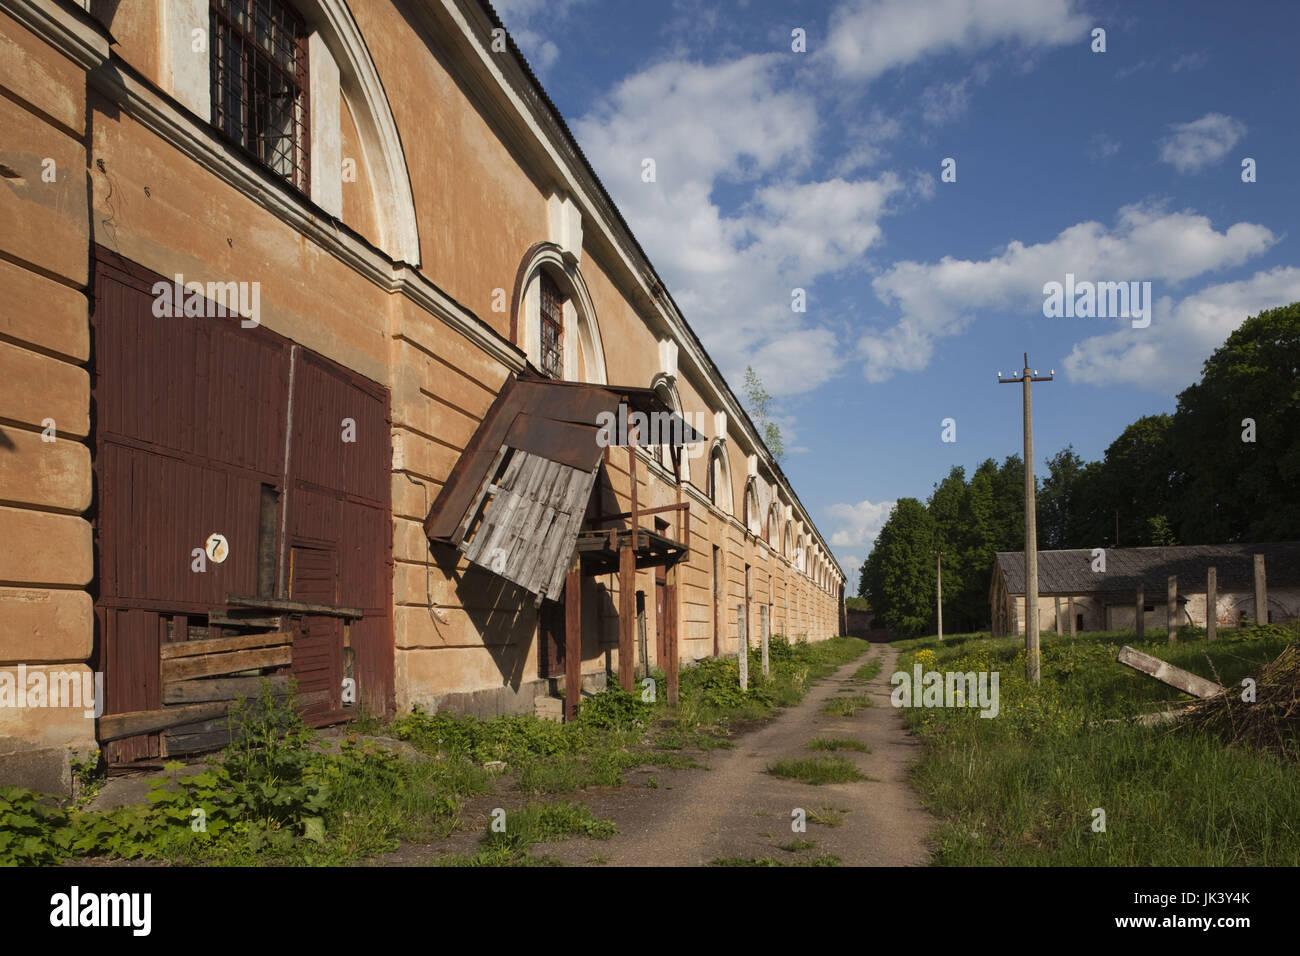 Latvia, Riga, Southeastern Latvia, Latgale Region, Daugava River Valley, Daugavpils, Russian Fortress, b. 1810 and - Stock Image